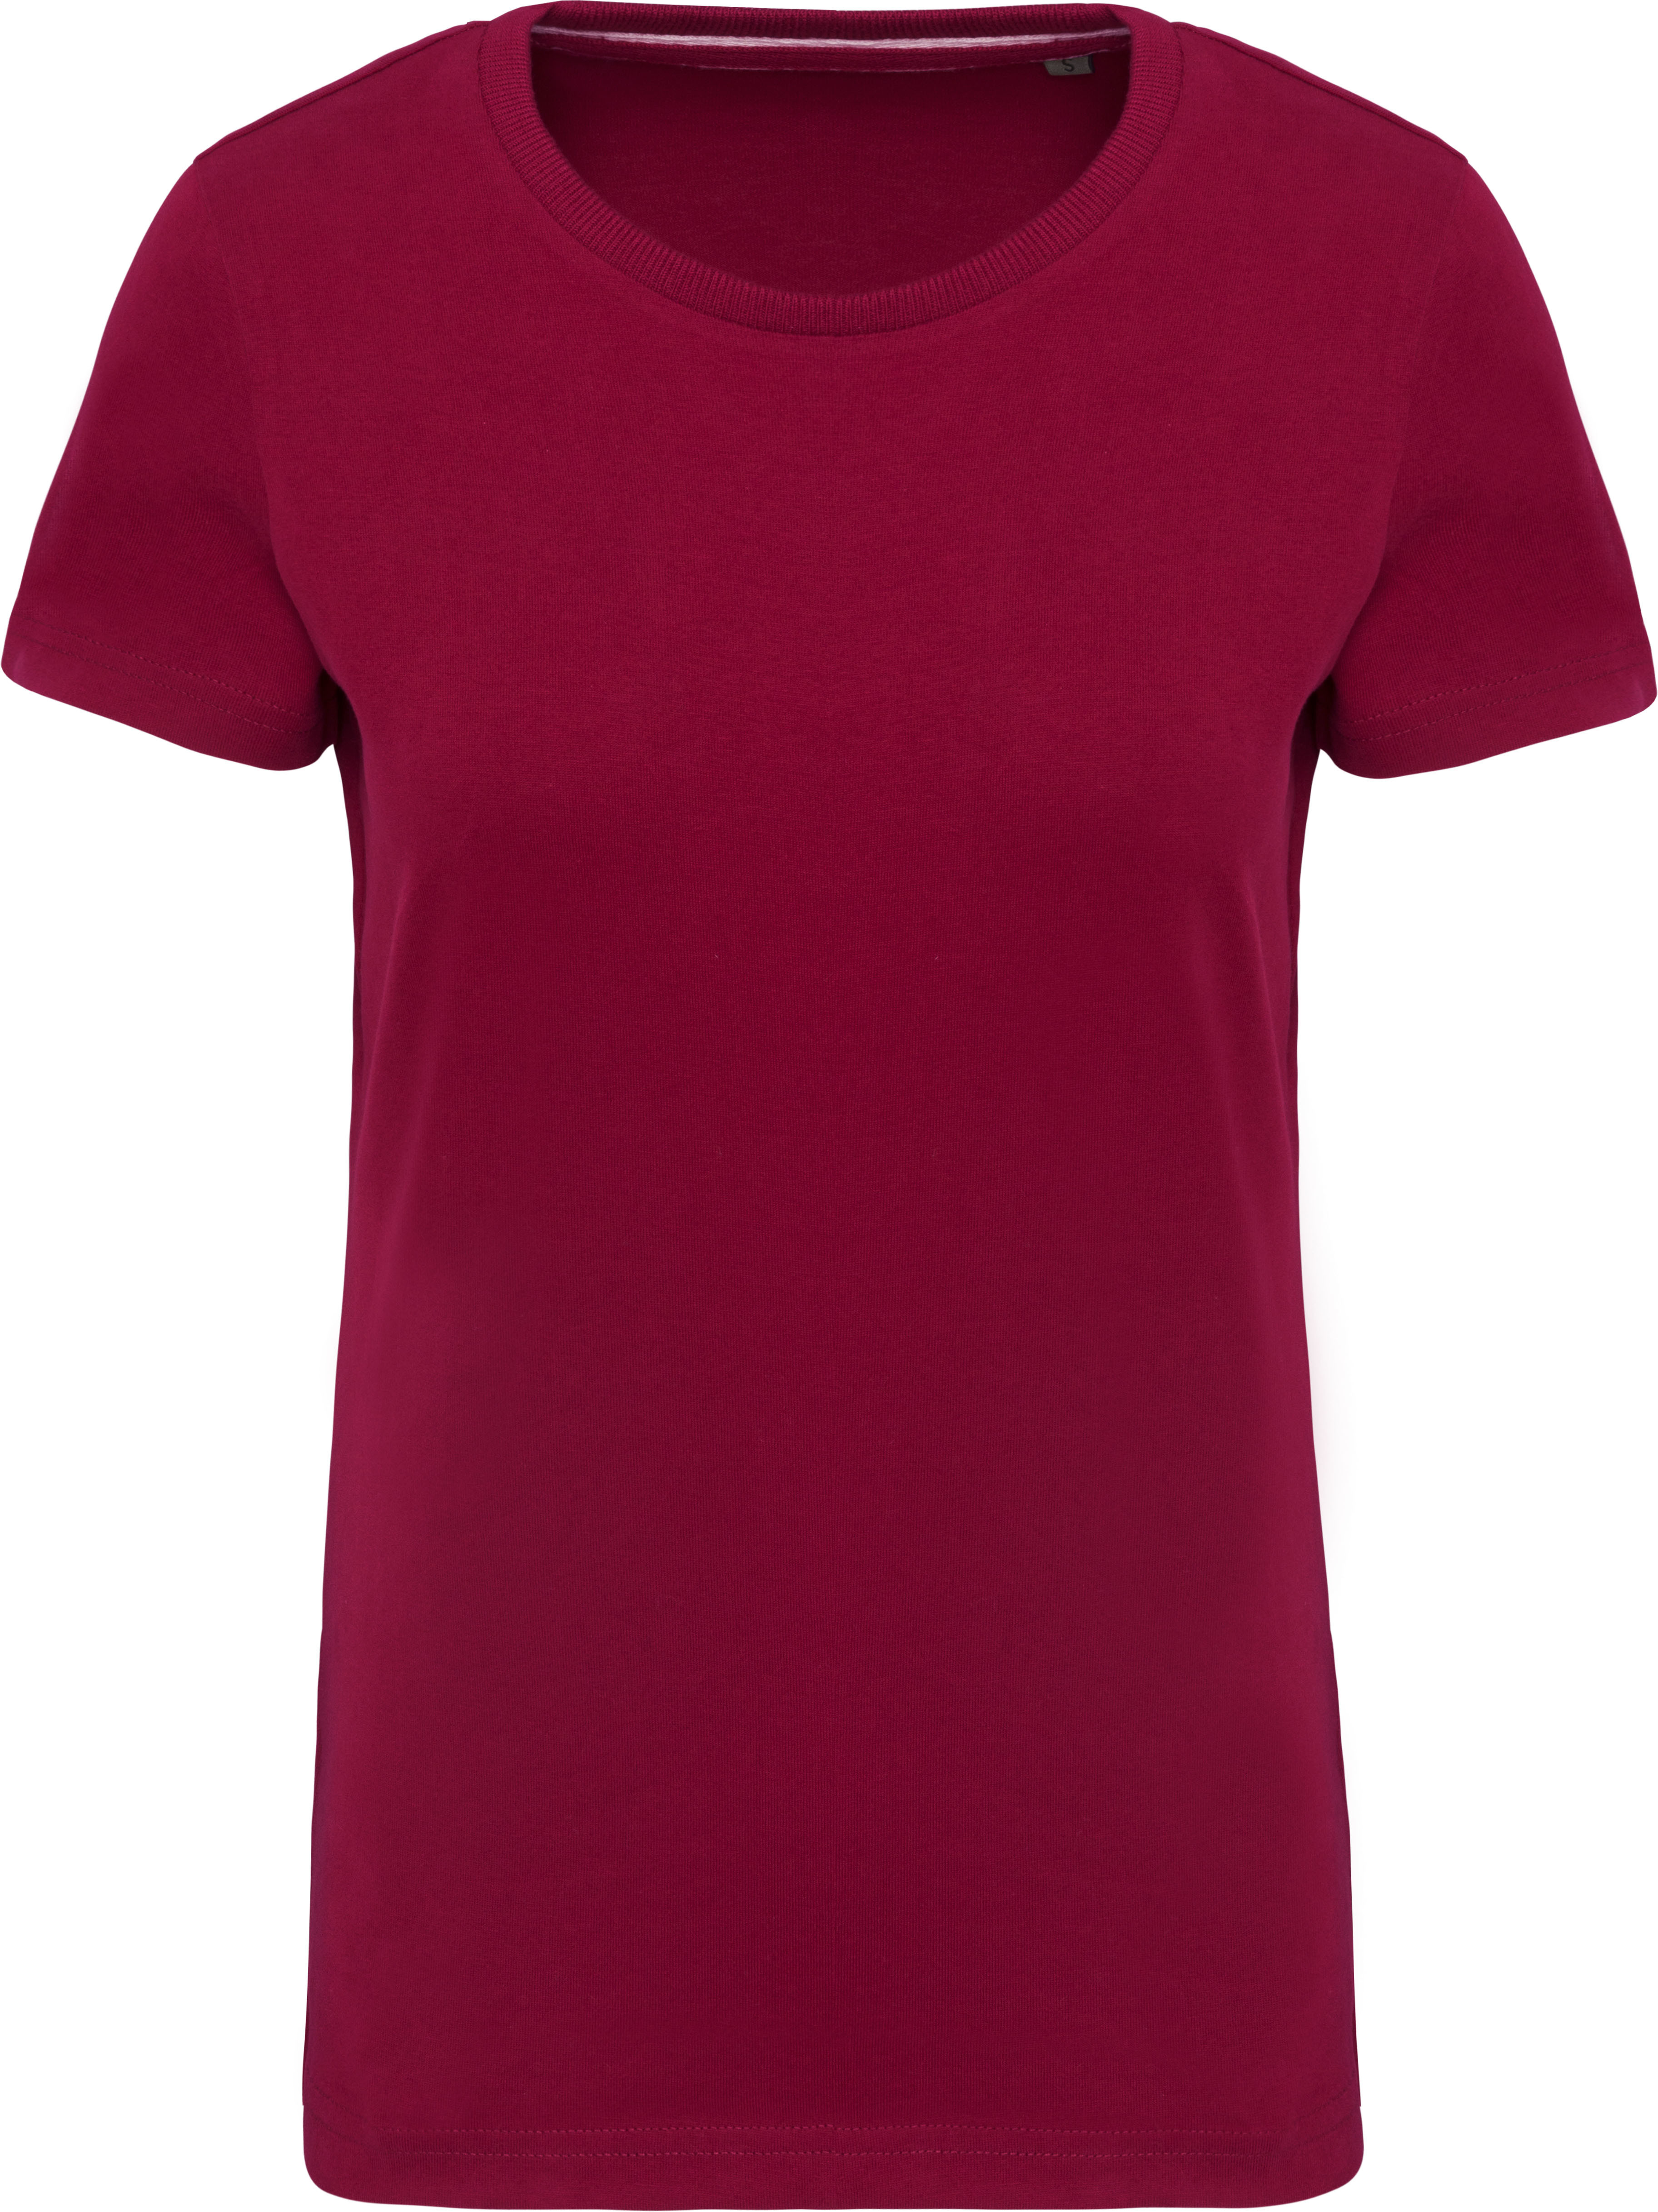 Tee-shirt vintage manches courtes femme - 2-1527-11